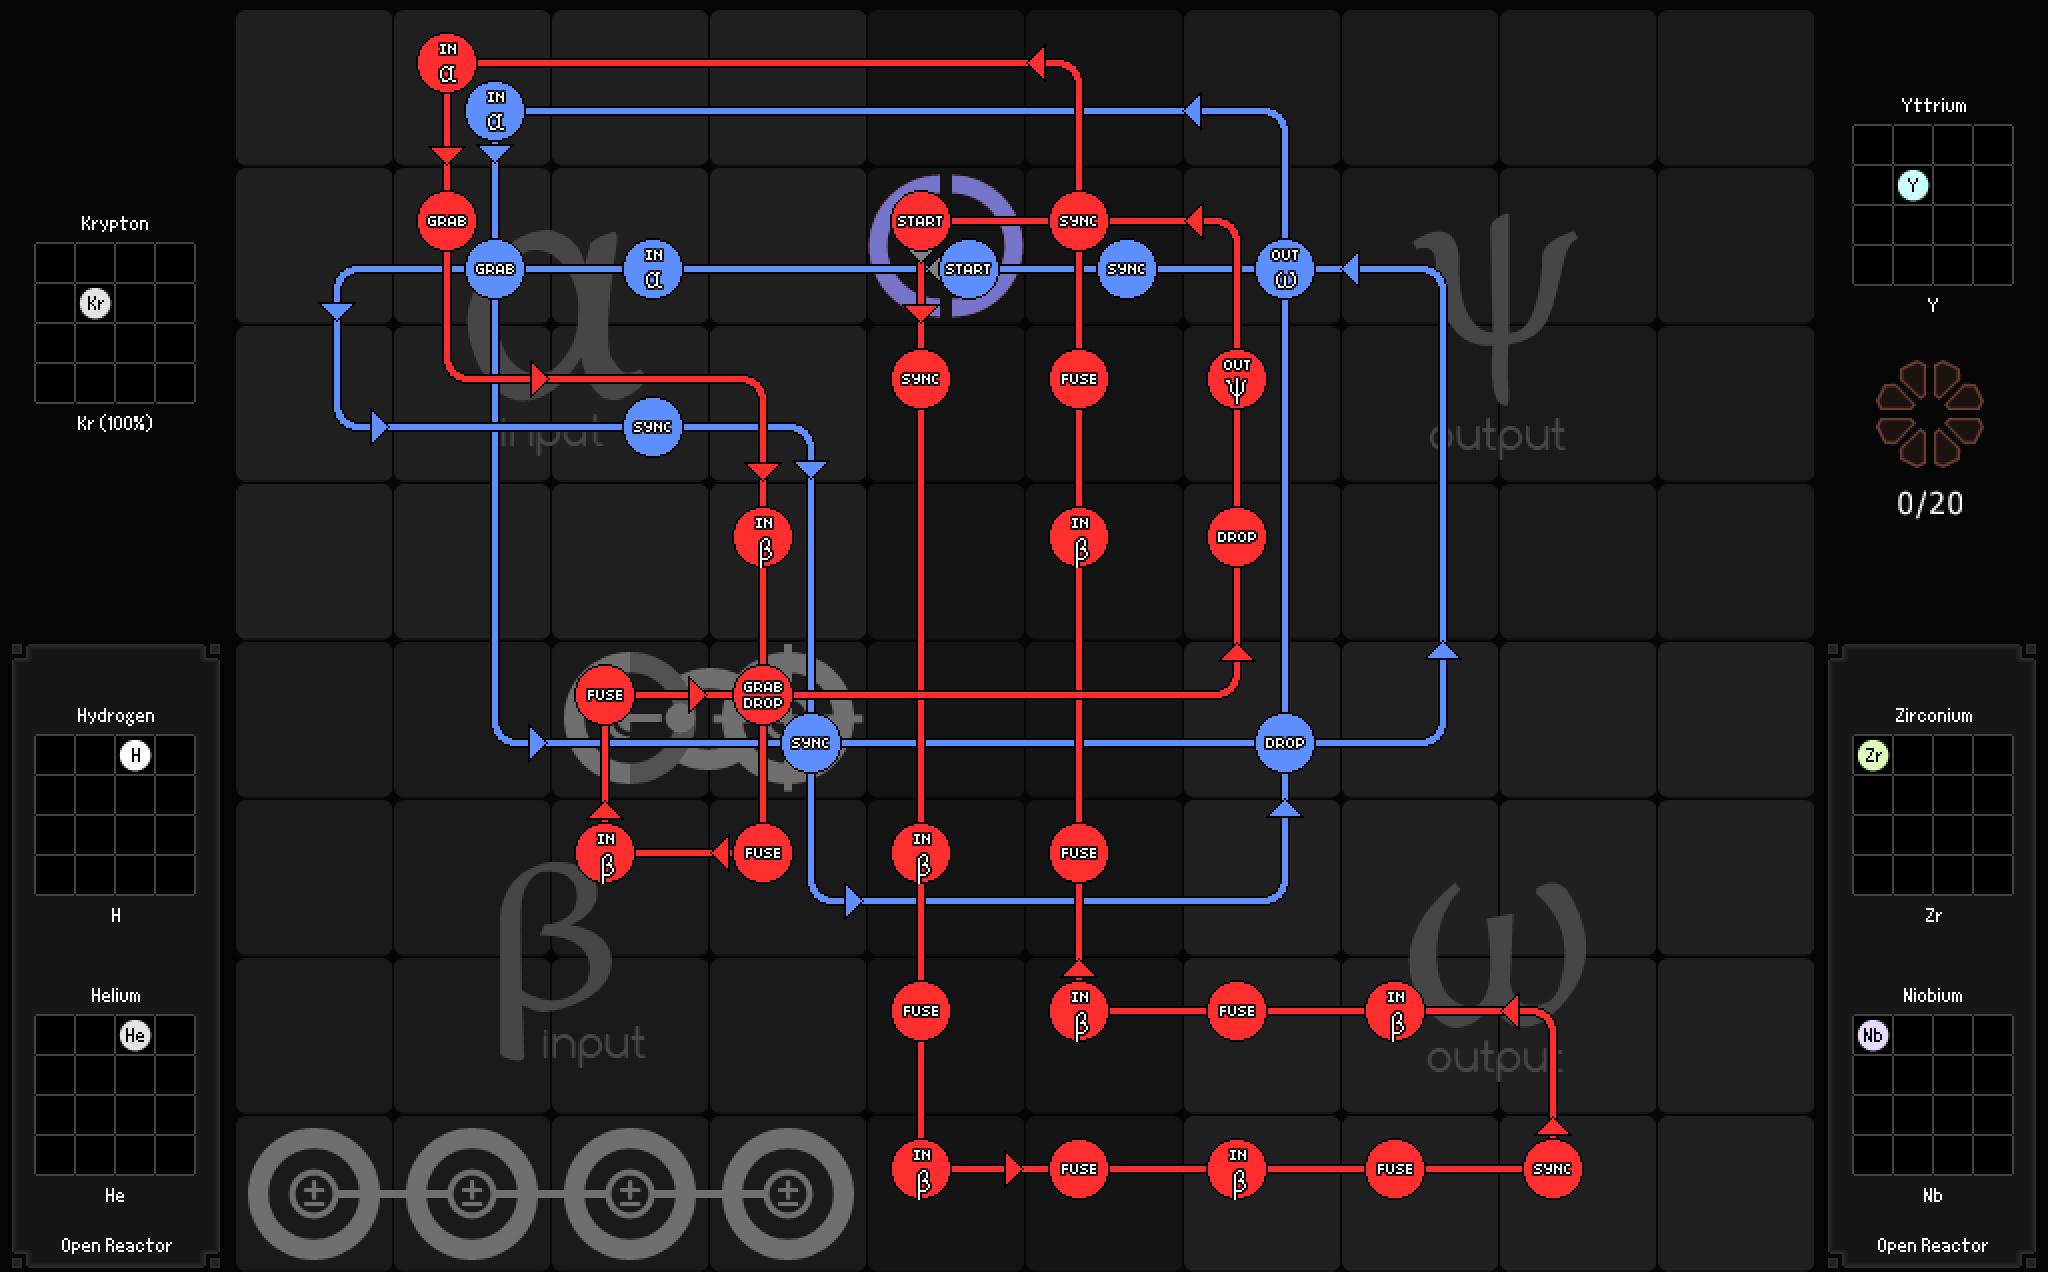 1_Story_Mode/5_Sikutar/SpaceChem-5.4.a/Reactor_1.png